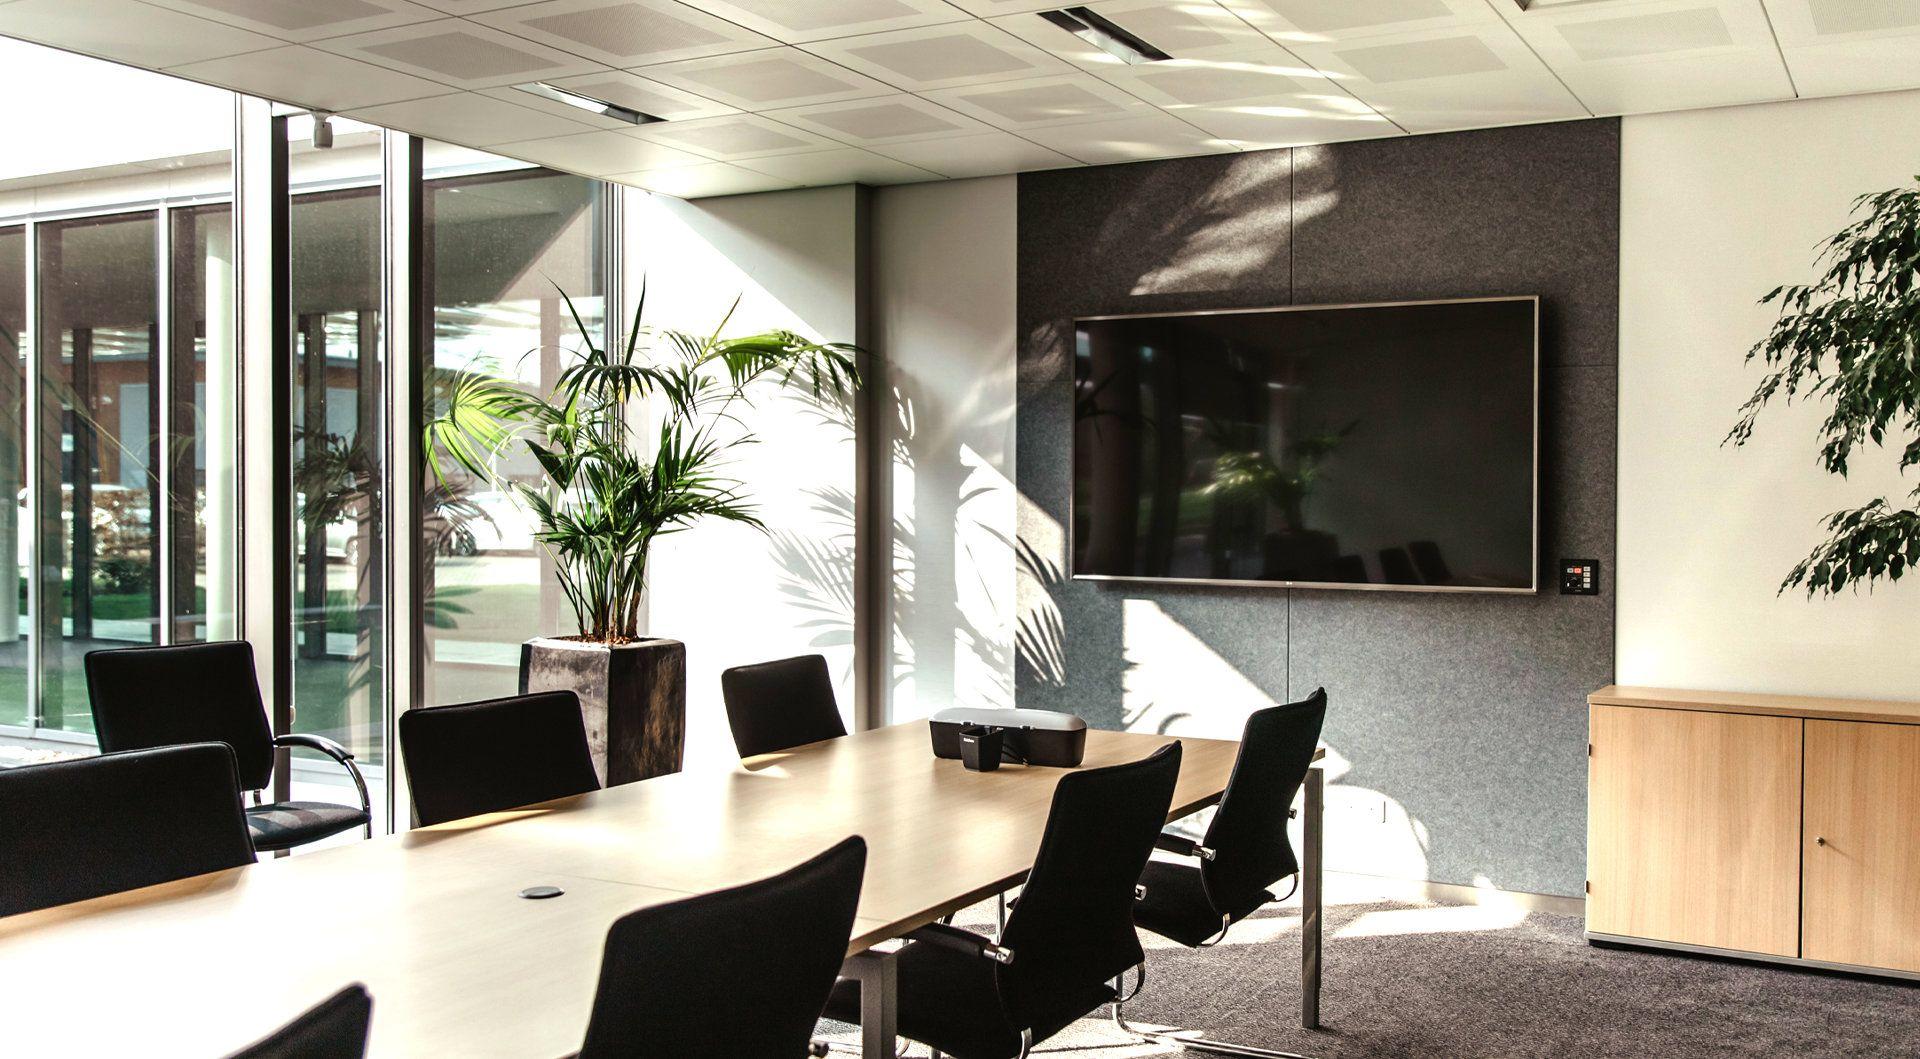 "LG 49SE3KE beeldkrant 124,5 cm (49"") LED Full HD Digitale signage flatscreen Zwart - Case studie de vries"